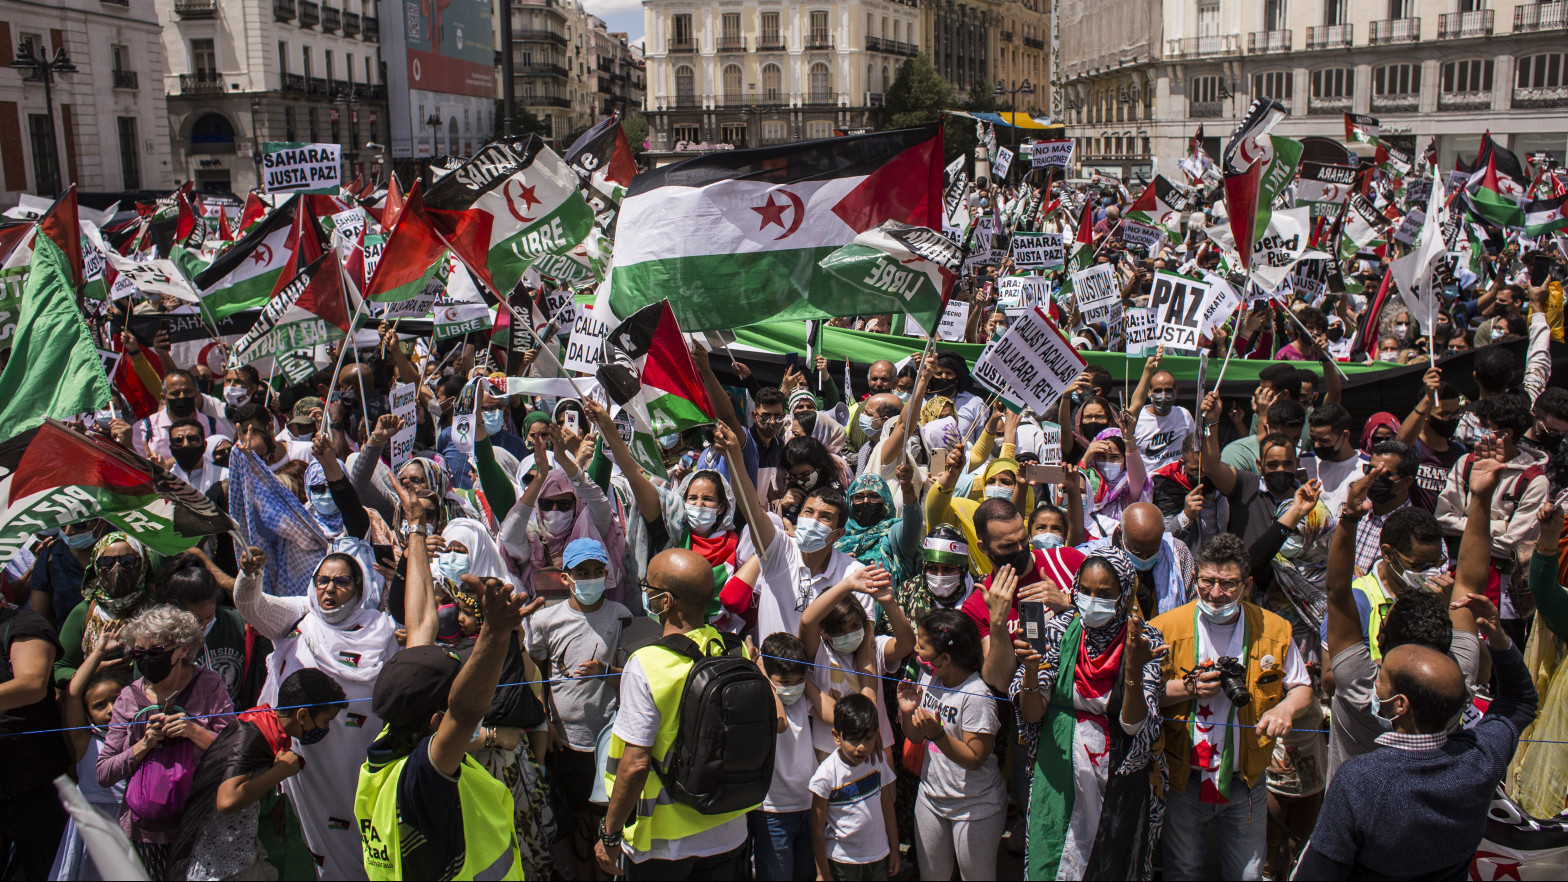 Saharauis de toda España se reúnen en Madrid para protestar contra la represión marroquí